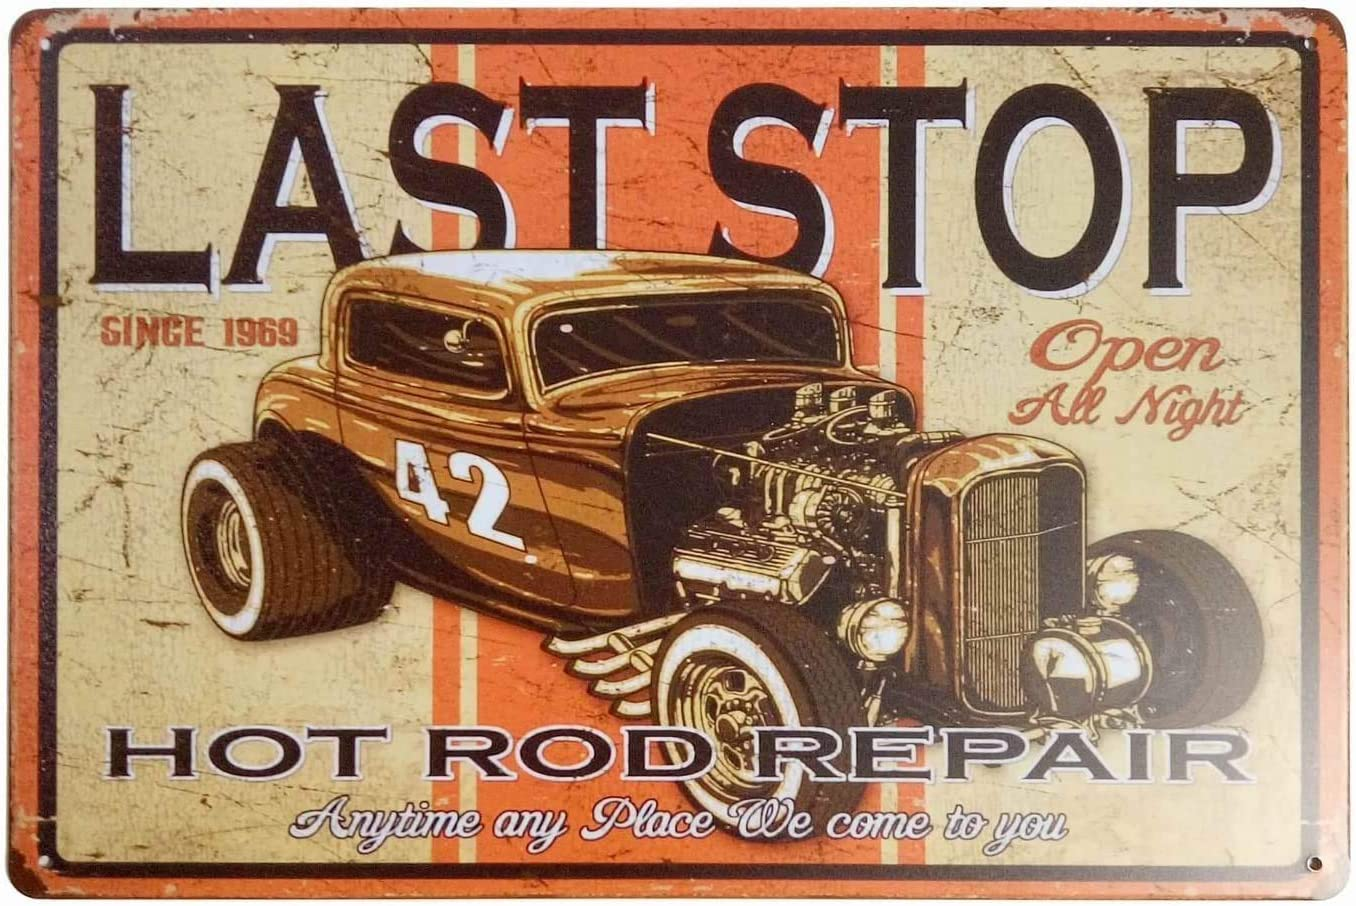 TOPYUN Last Stop Hot Rod Repair Car Signs Metal Vintage Gifts for Men Retro Metal Tin Sign Art Wall Decor 12 X 8 Inches